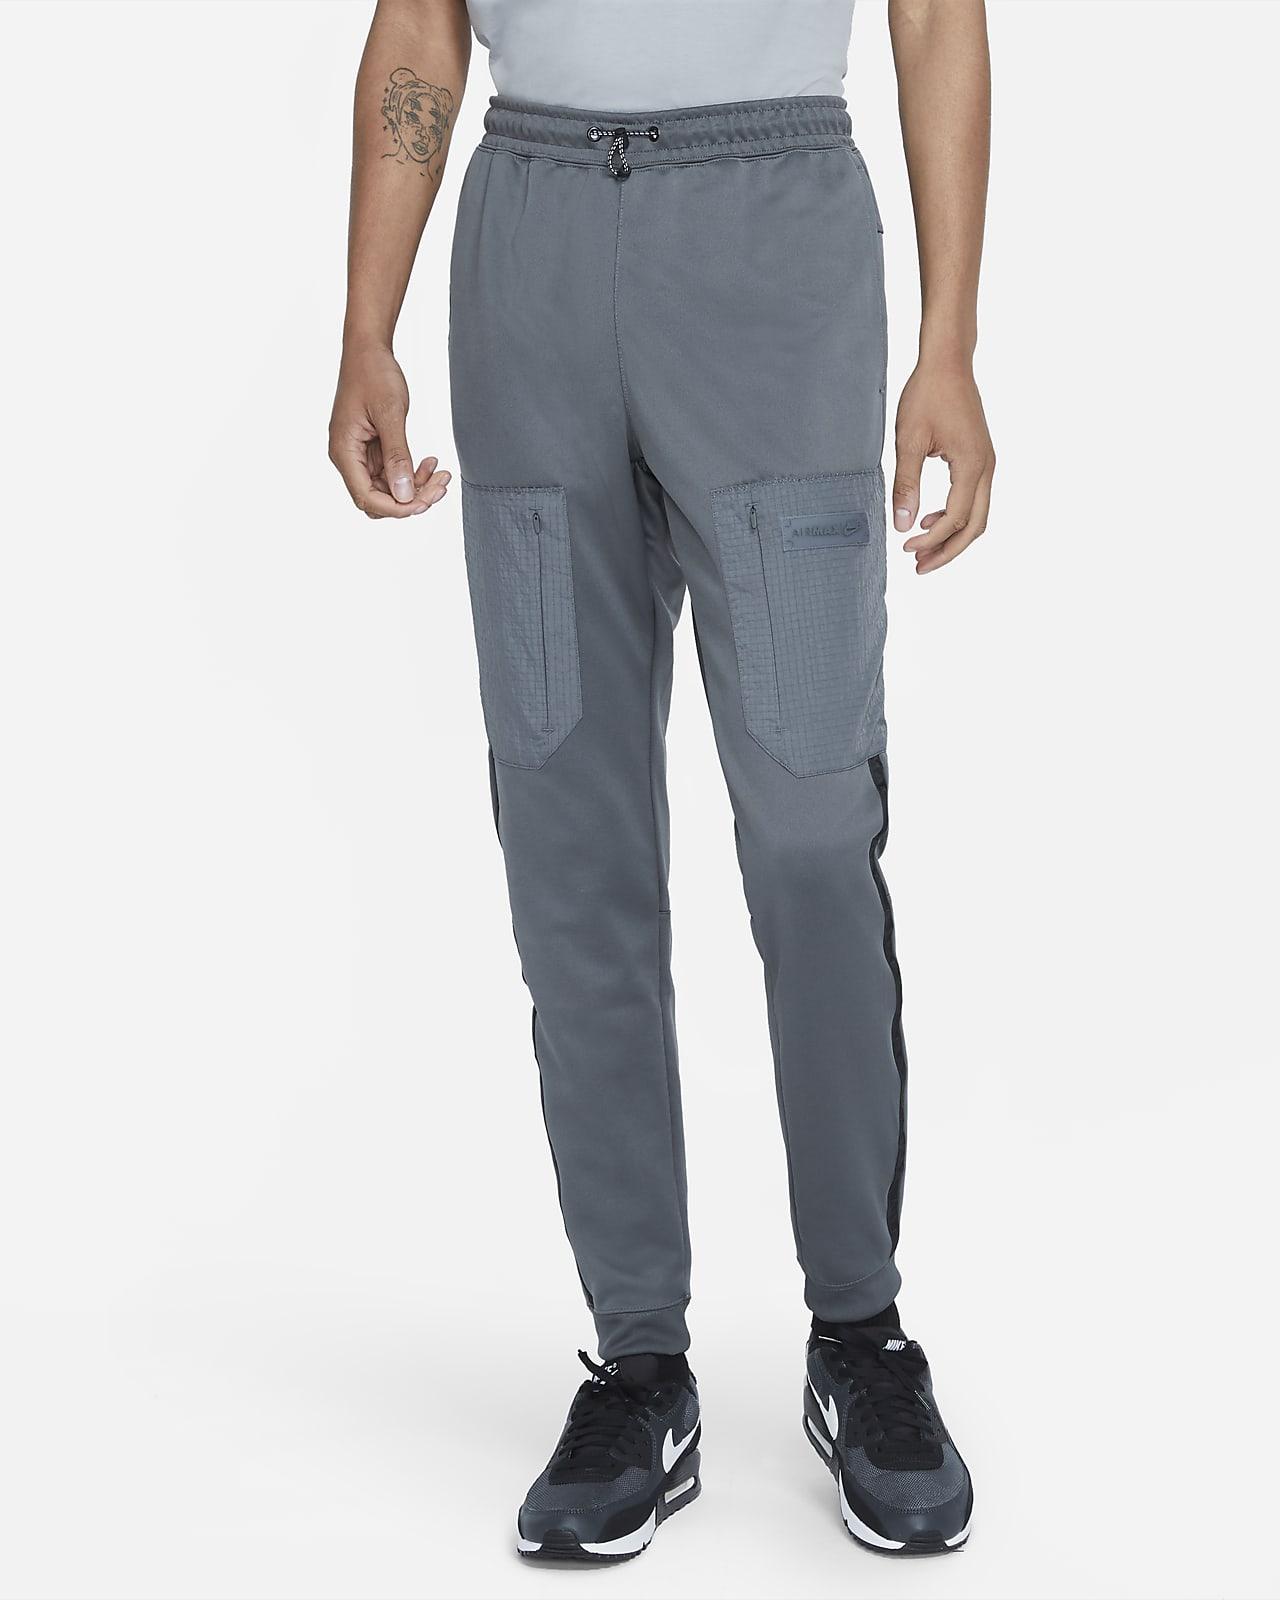 Nike Sportswear Air Max Herrenhose